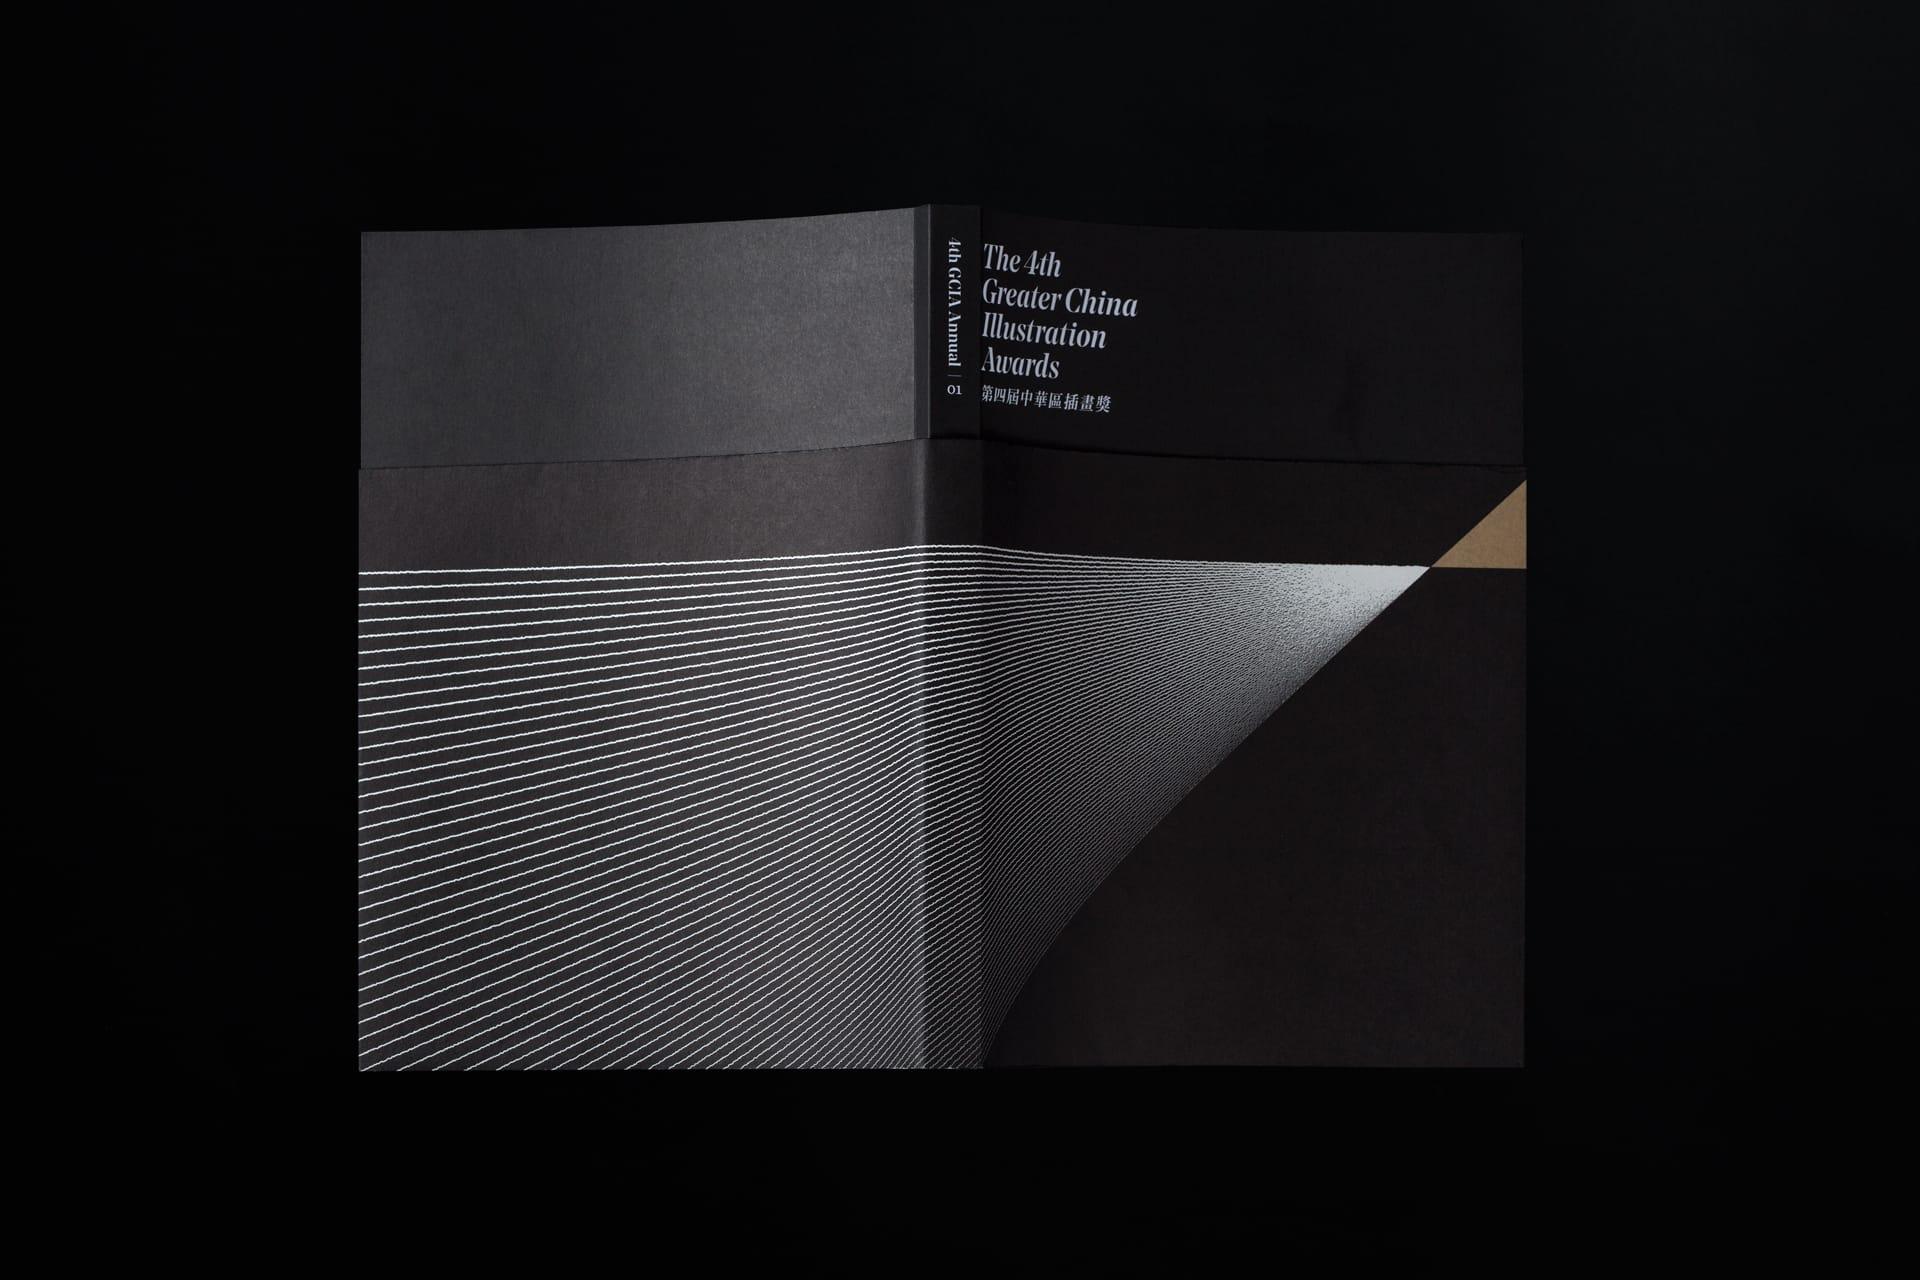 4th-greater-china-illustration-awards_04